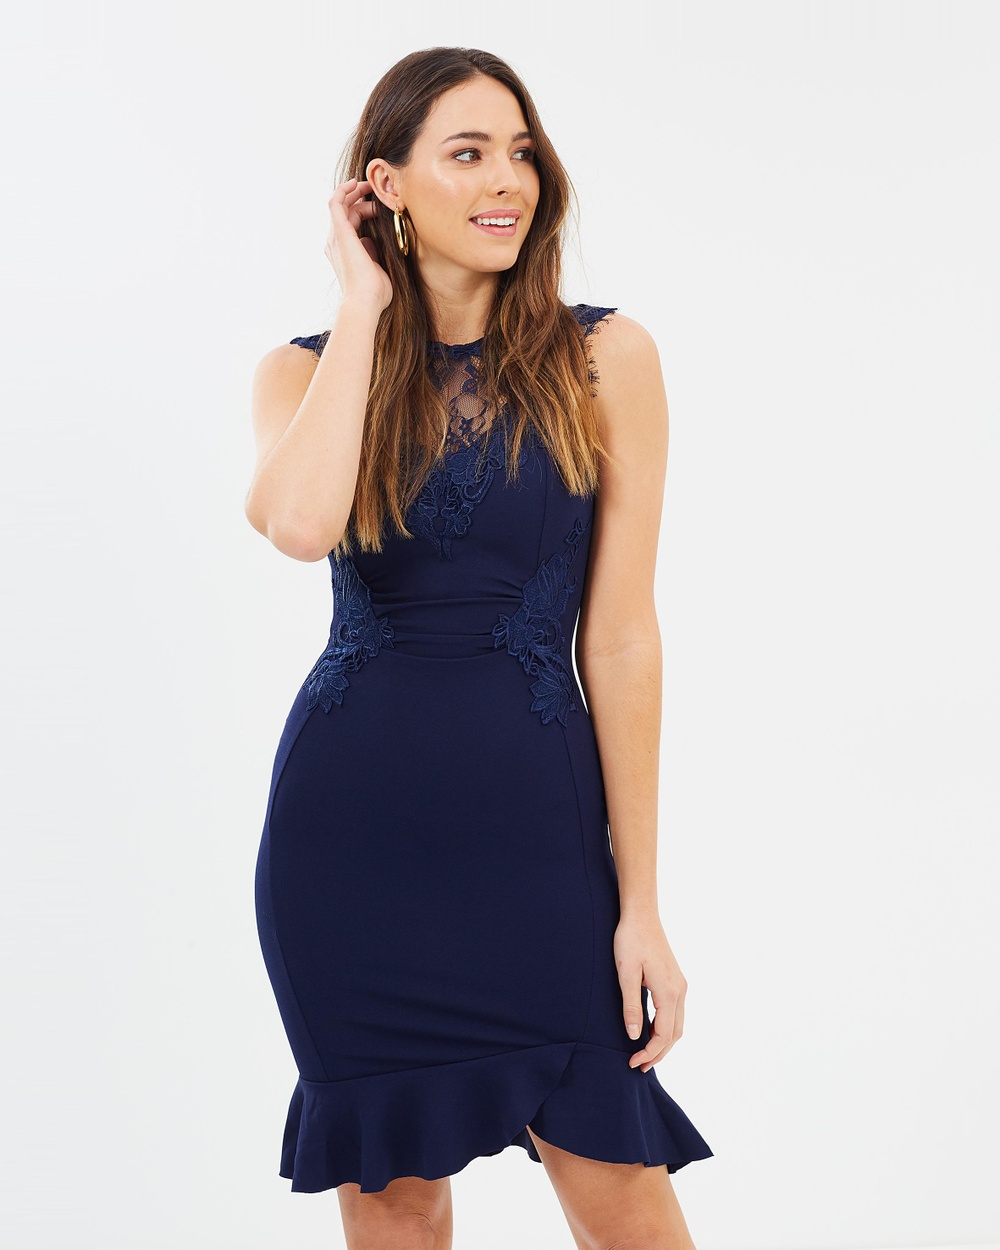 Lipsy Ruched Lace Frill Hem Dress Dresses Navy Ruched Lace Frill Hem Dress